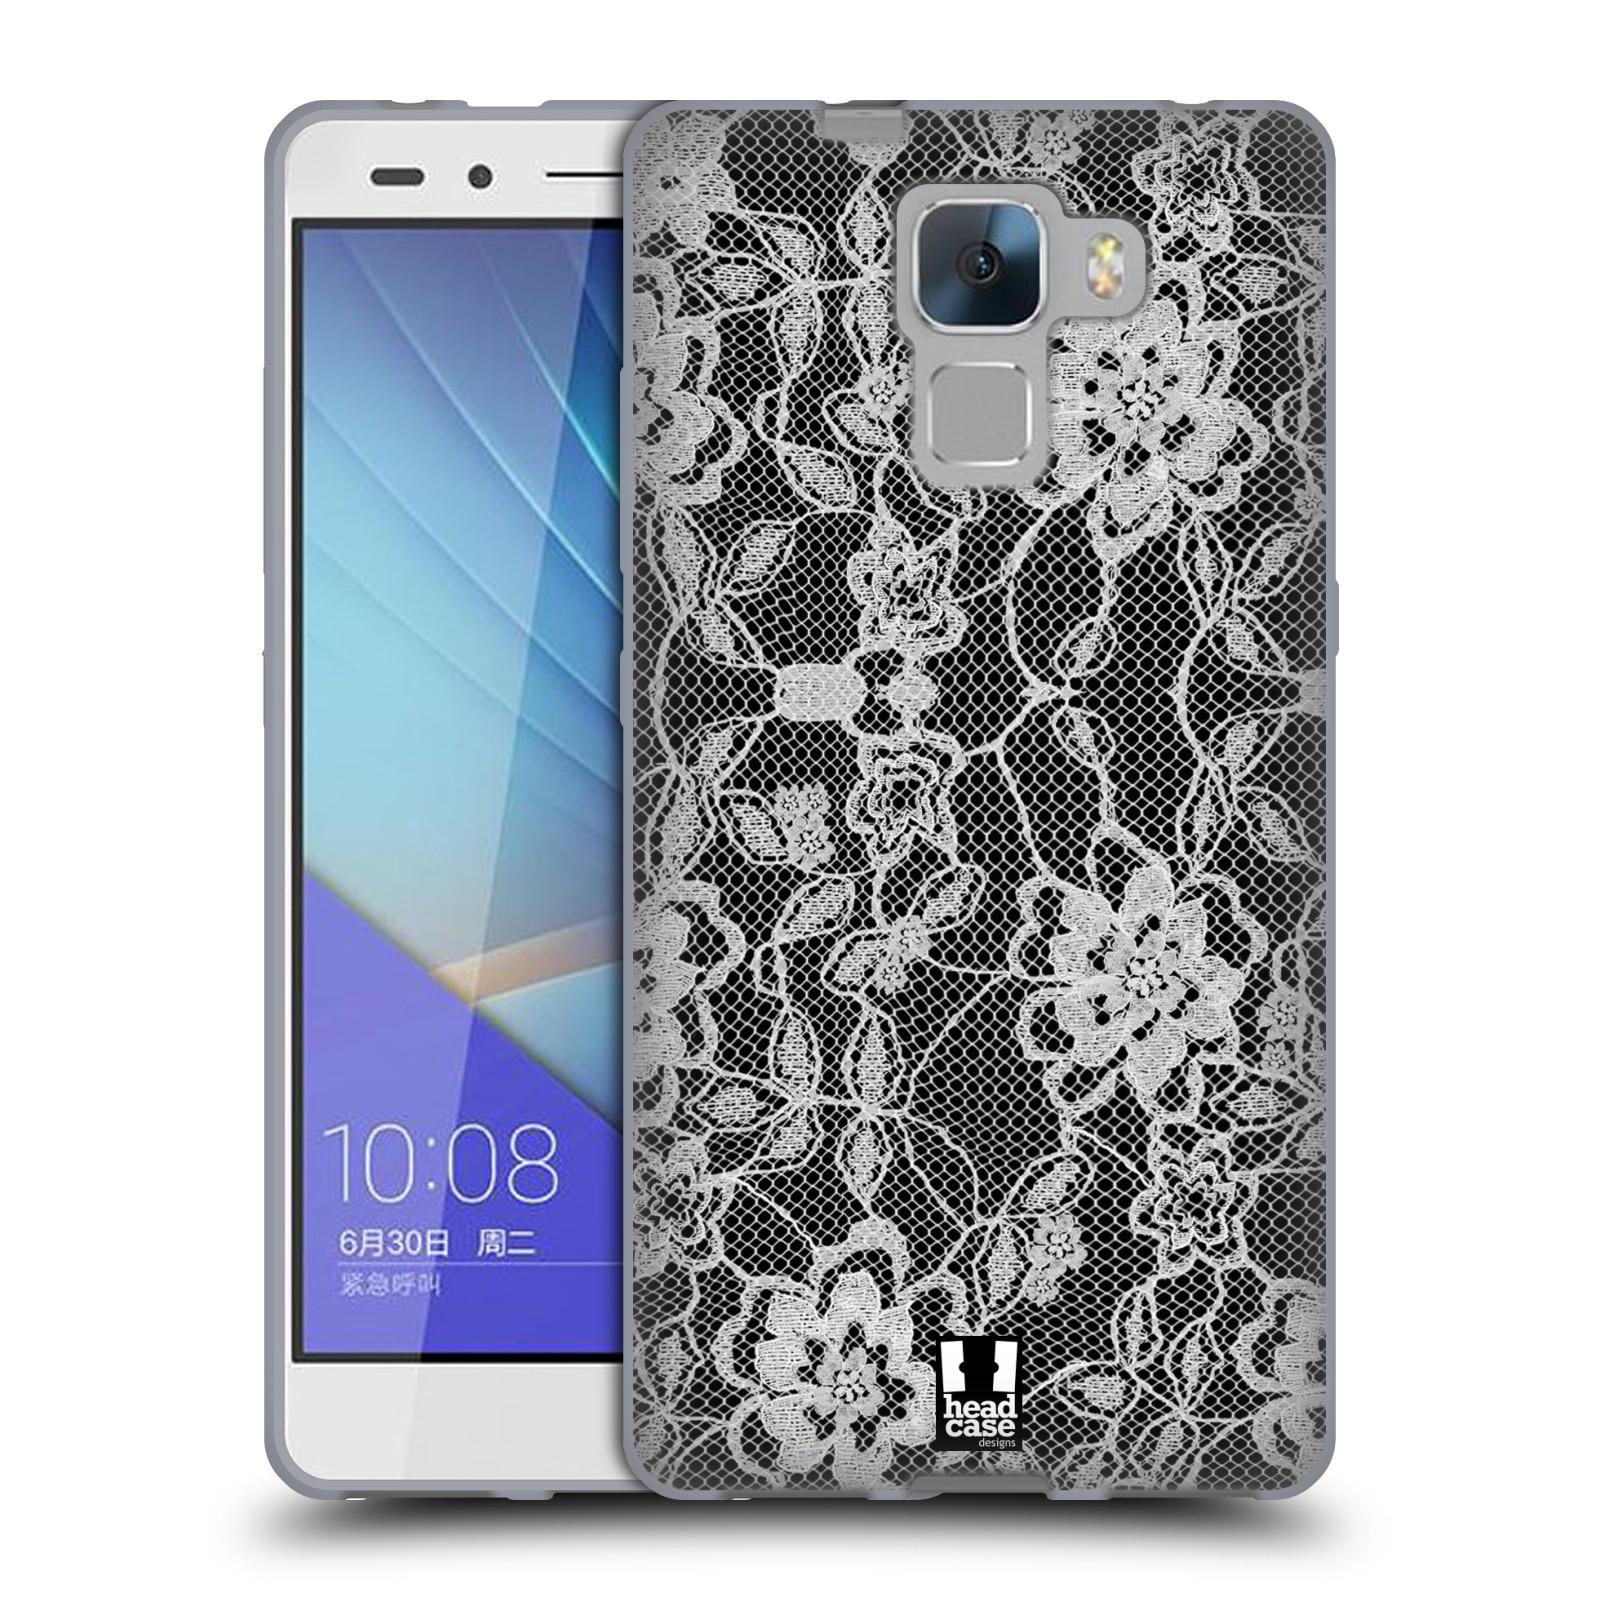 Silikonové pouzdro na mobil Honor 7 HEAD CASE FLOWERY KRAJKA (Silikonový kryt či obal na mobilní telefon Huawei Honor 7)